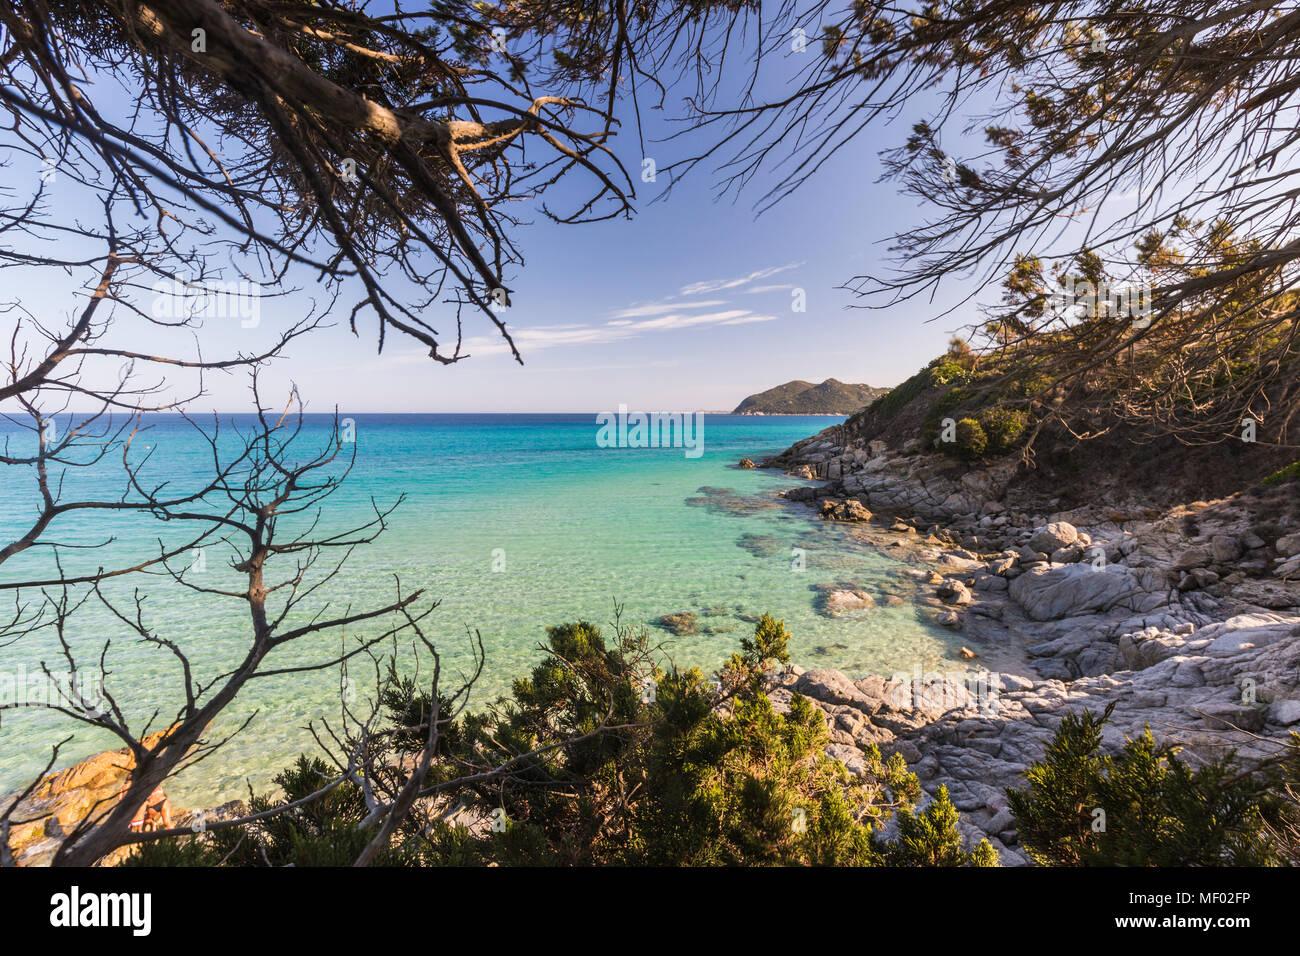 La végétation méditerranéenne cadres la mer turquoise de Cala Monte Turno Castiadas Cagliari Sardaigne Italie Europe Photo Stock